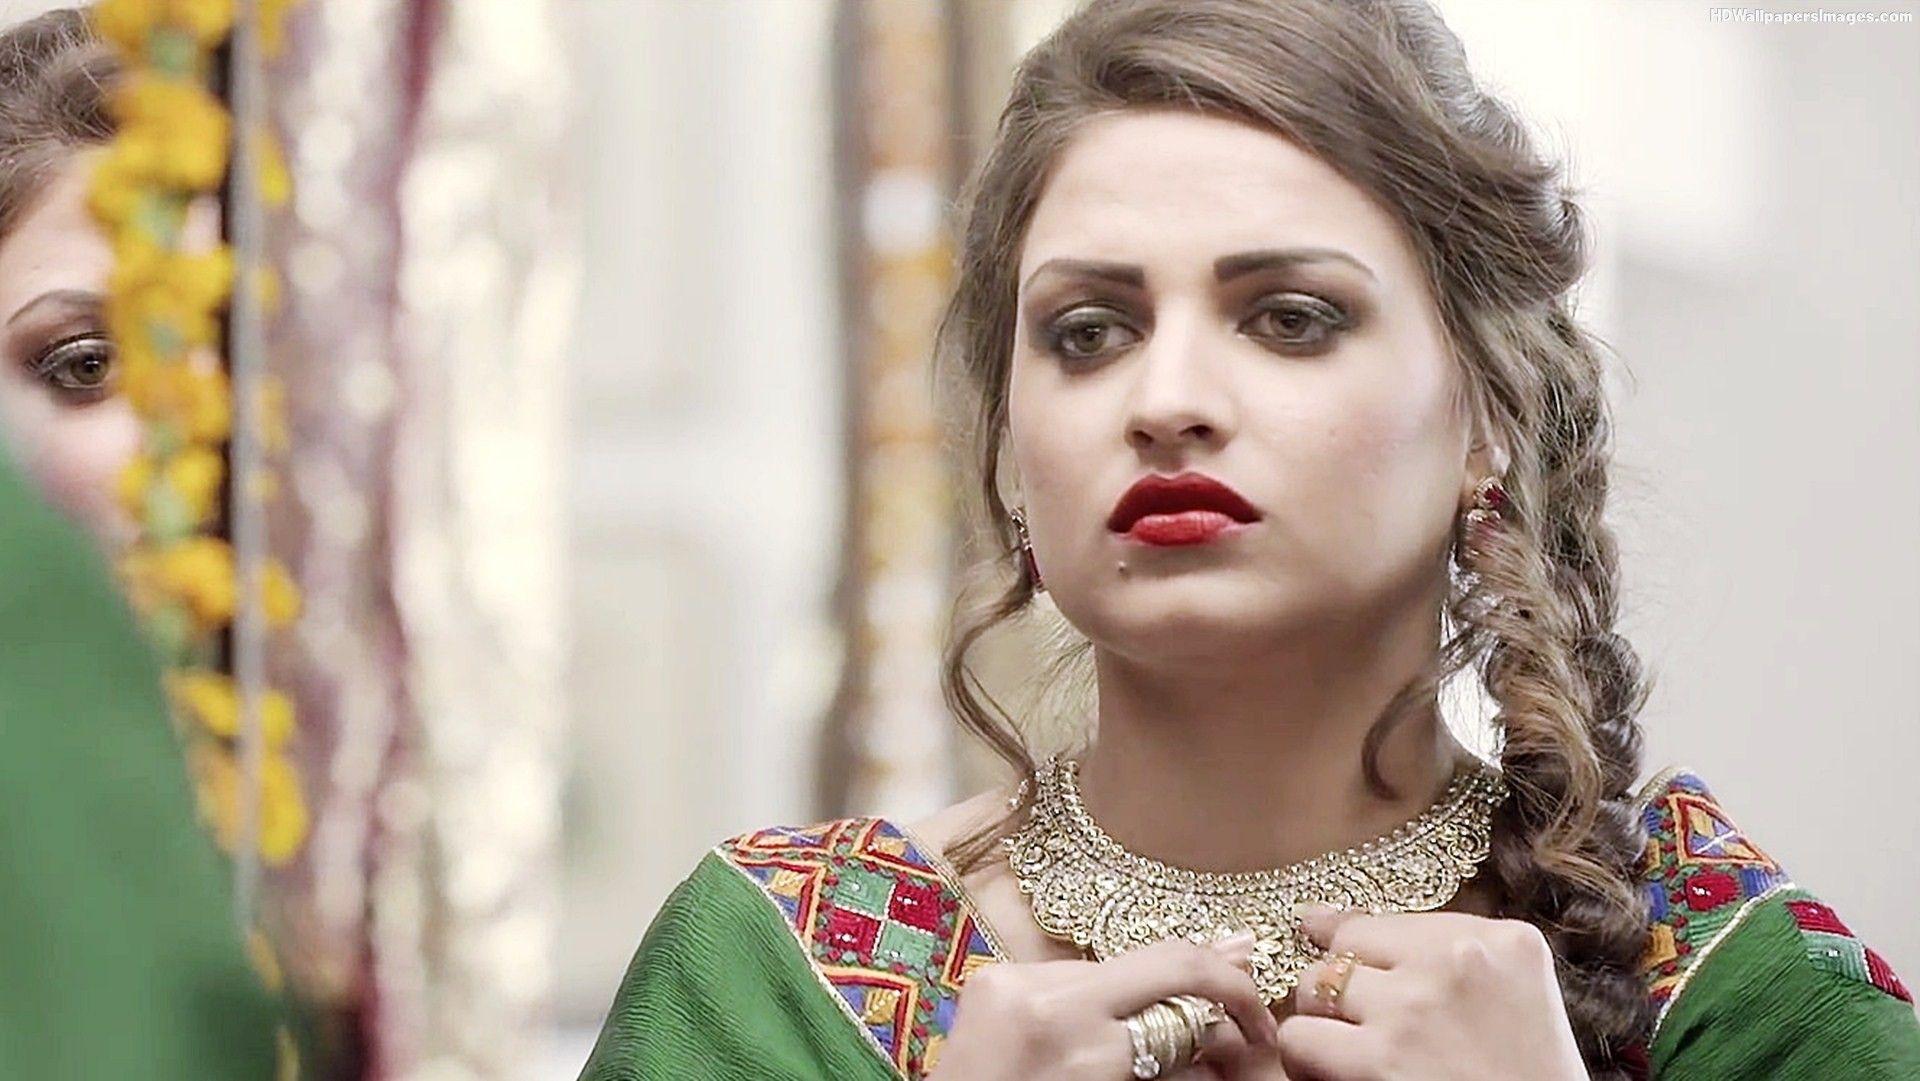 Beautiful Punjabi Girls Wallpapers and Pictures \u2013 One HD Wallpaper